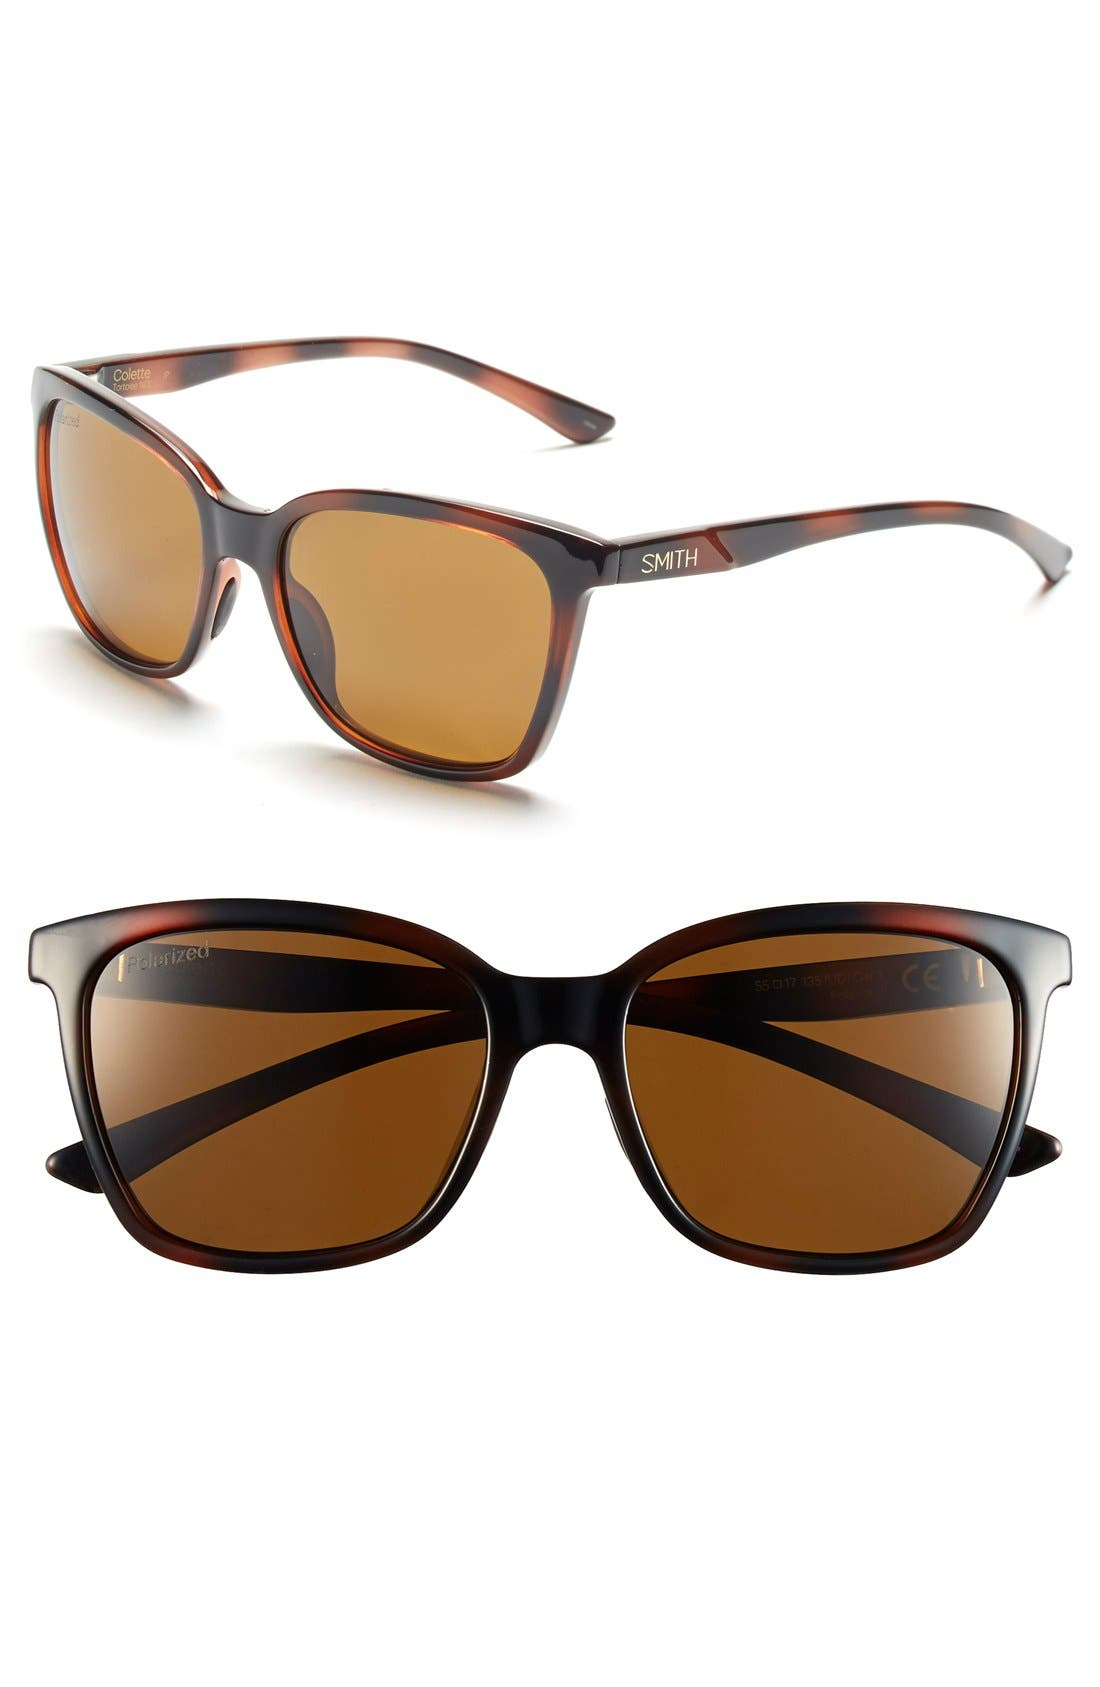 Main Image - Smith 'Colette' 55mm Polarized Sunglasses